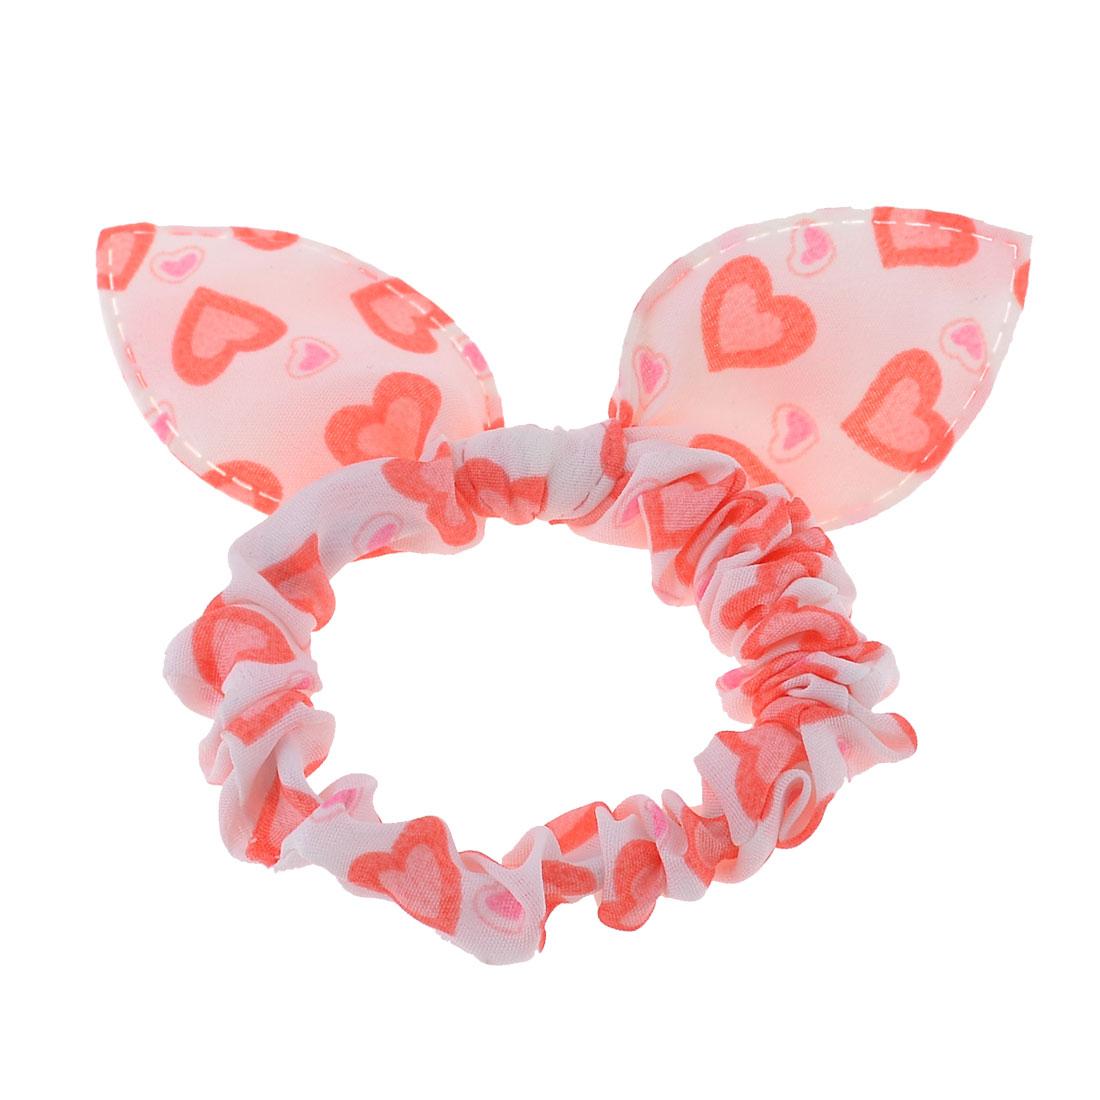 Ladies Rabbit Ear Shape Stretchy Band Hair Tie Ponytail Holder Light Pink White